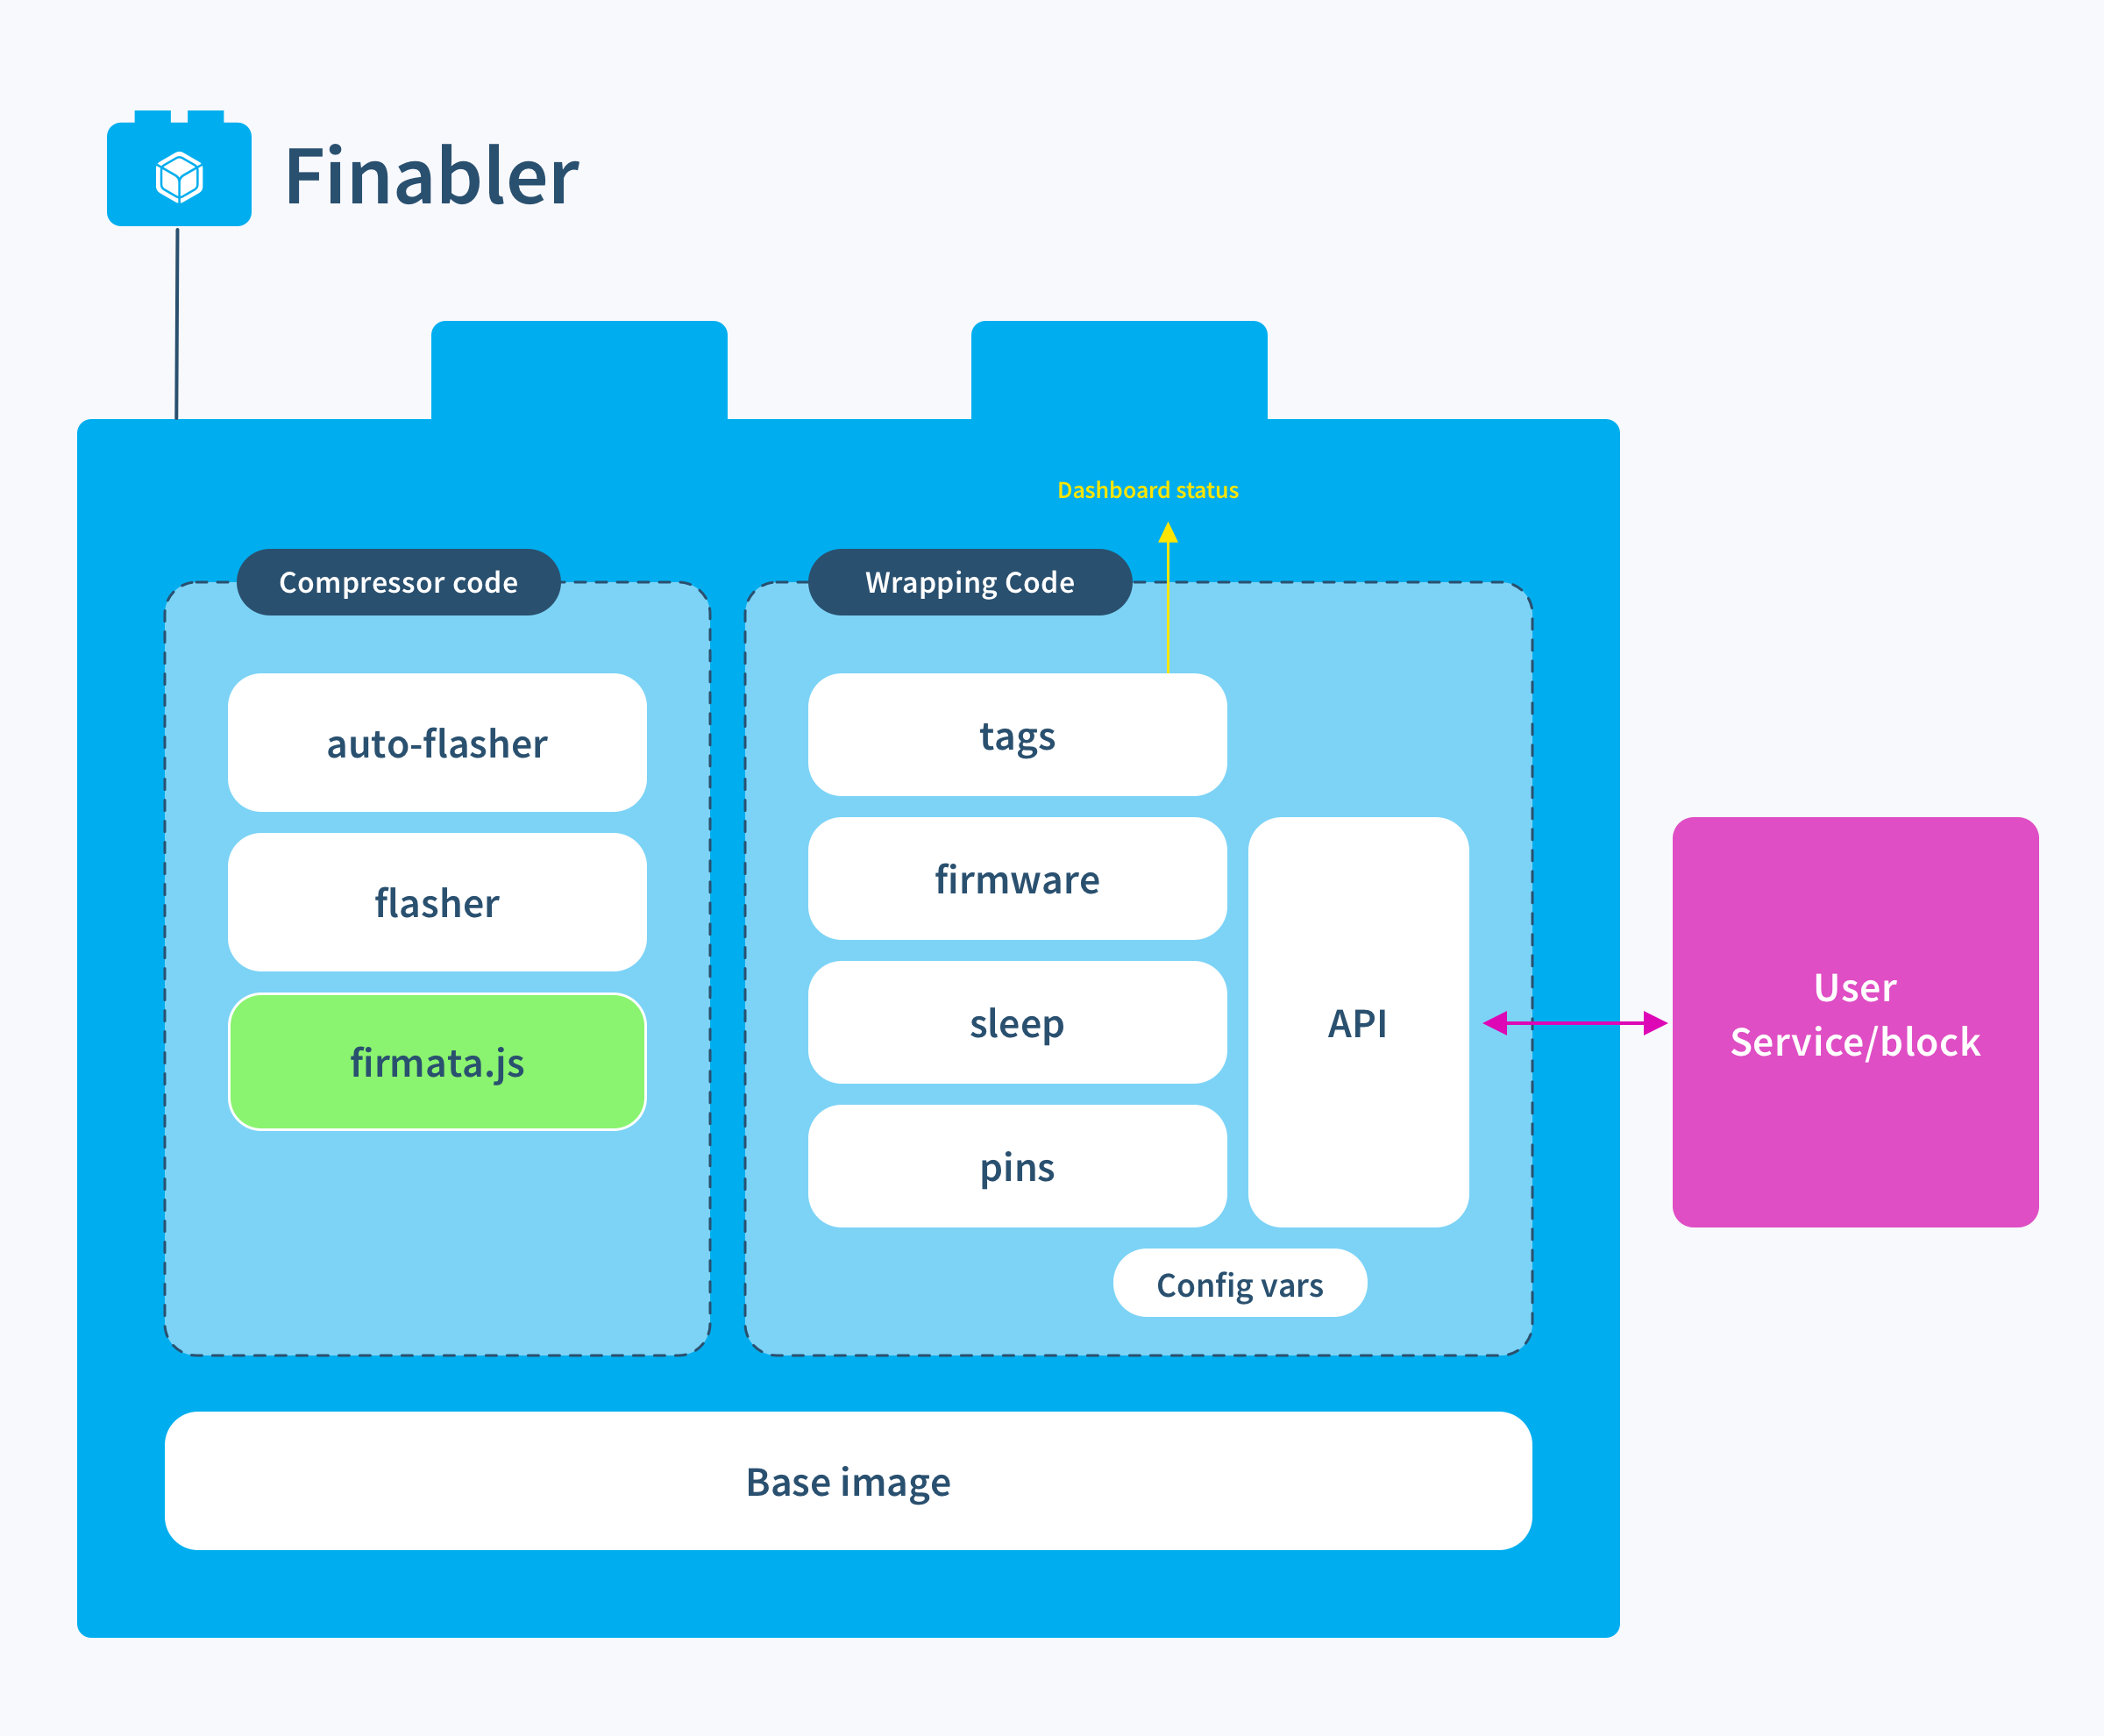 Taking a closer look at Finabler block